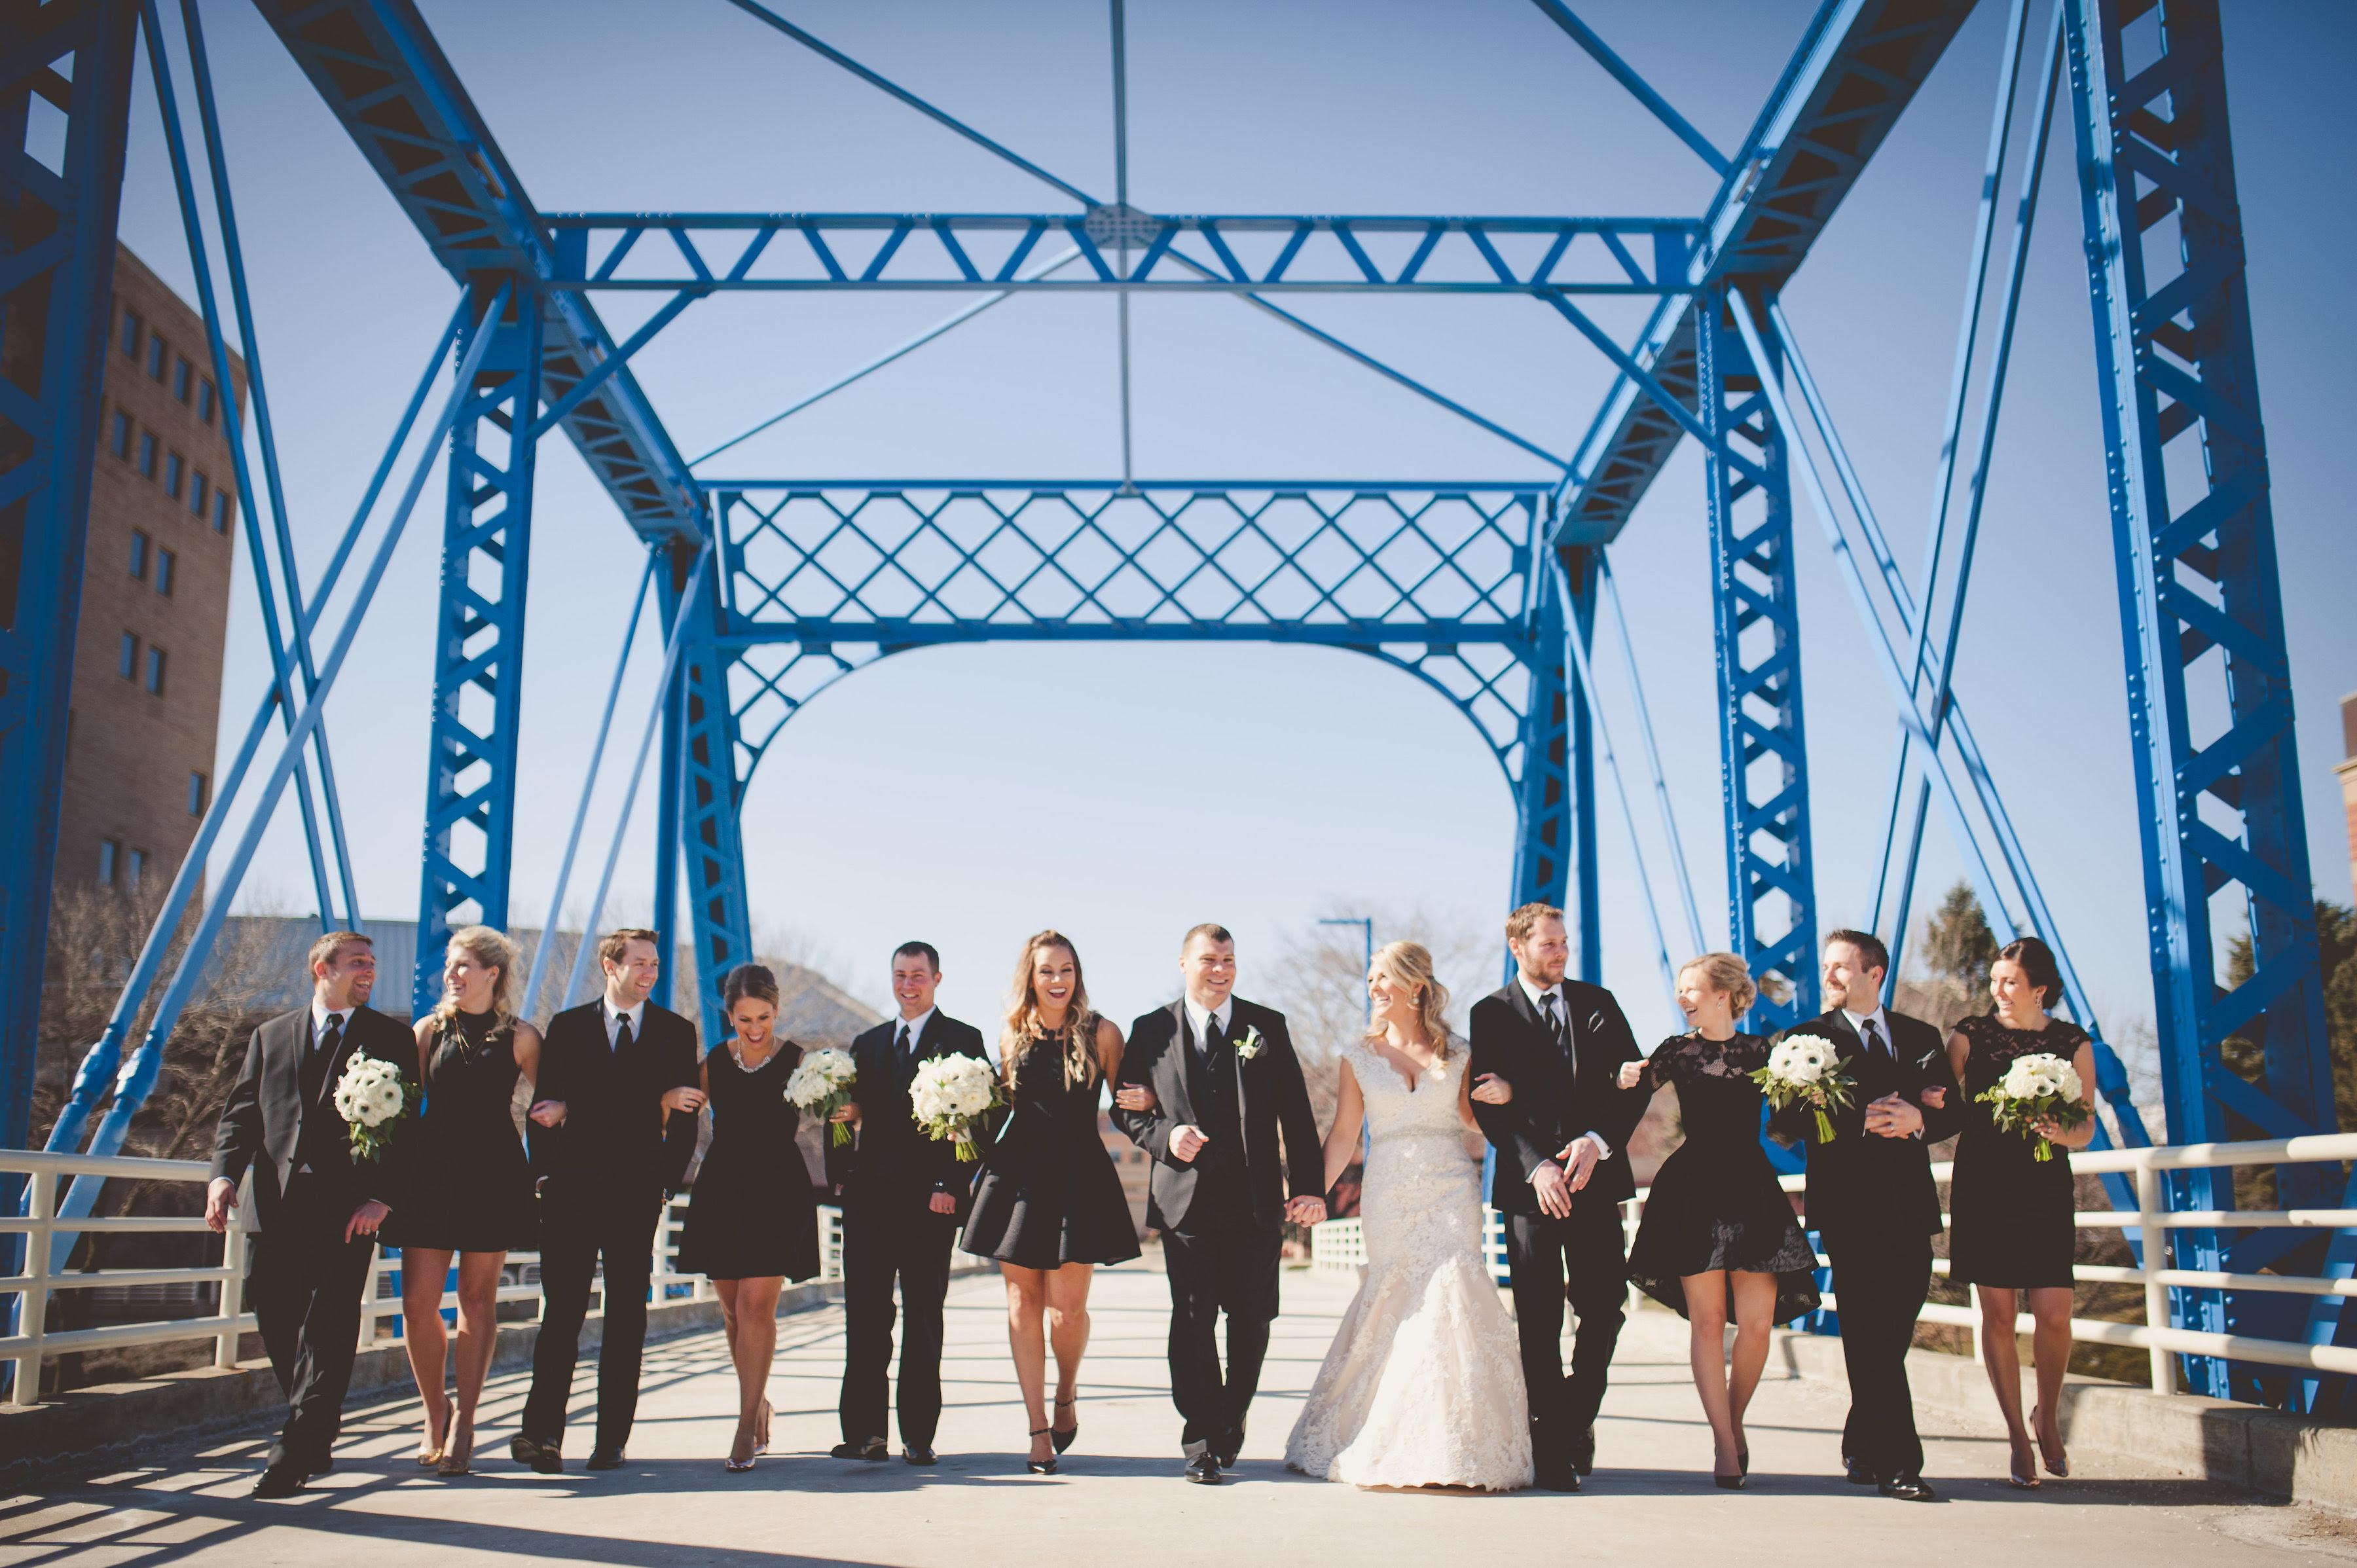 Wedding Reception Halls Grand Rapids Mi: Grand rapids wedding ...